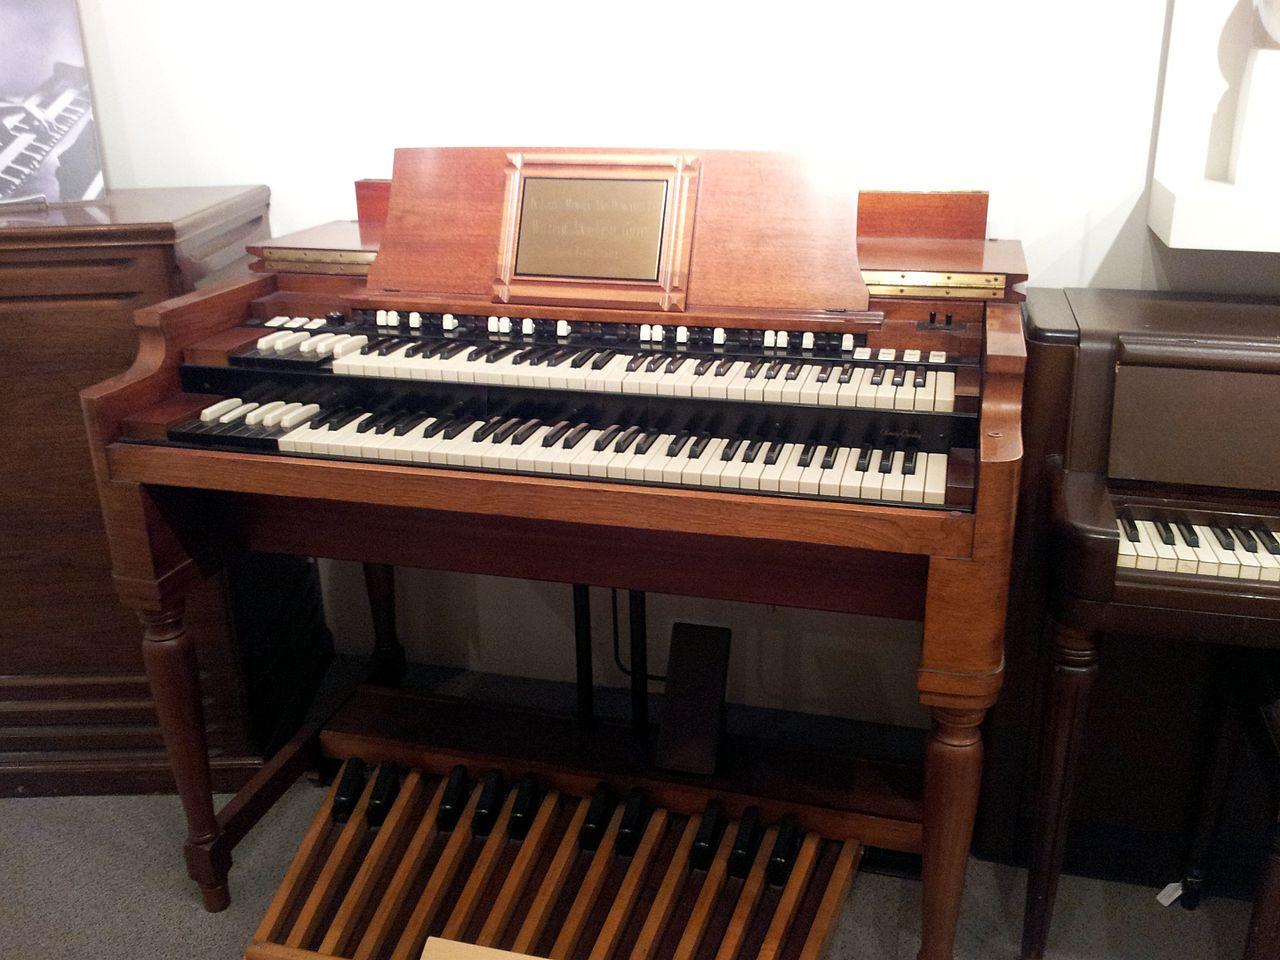 Hammond identity, dating - The Organ Forum